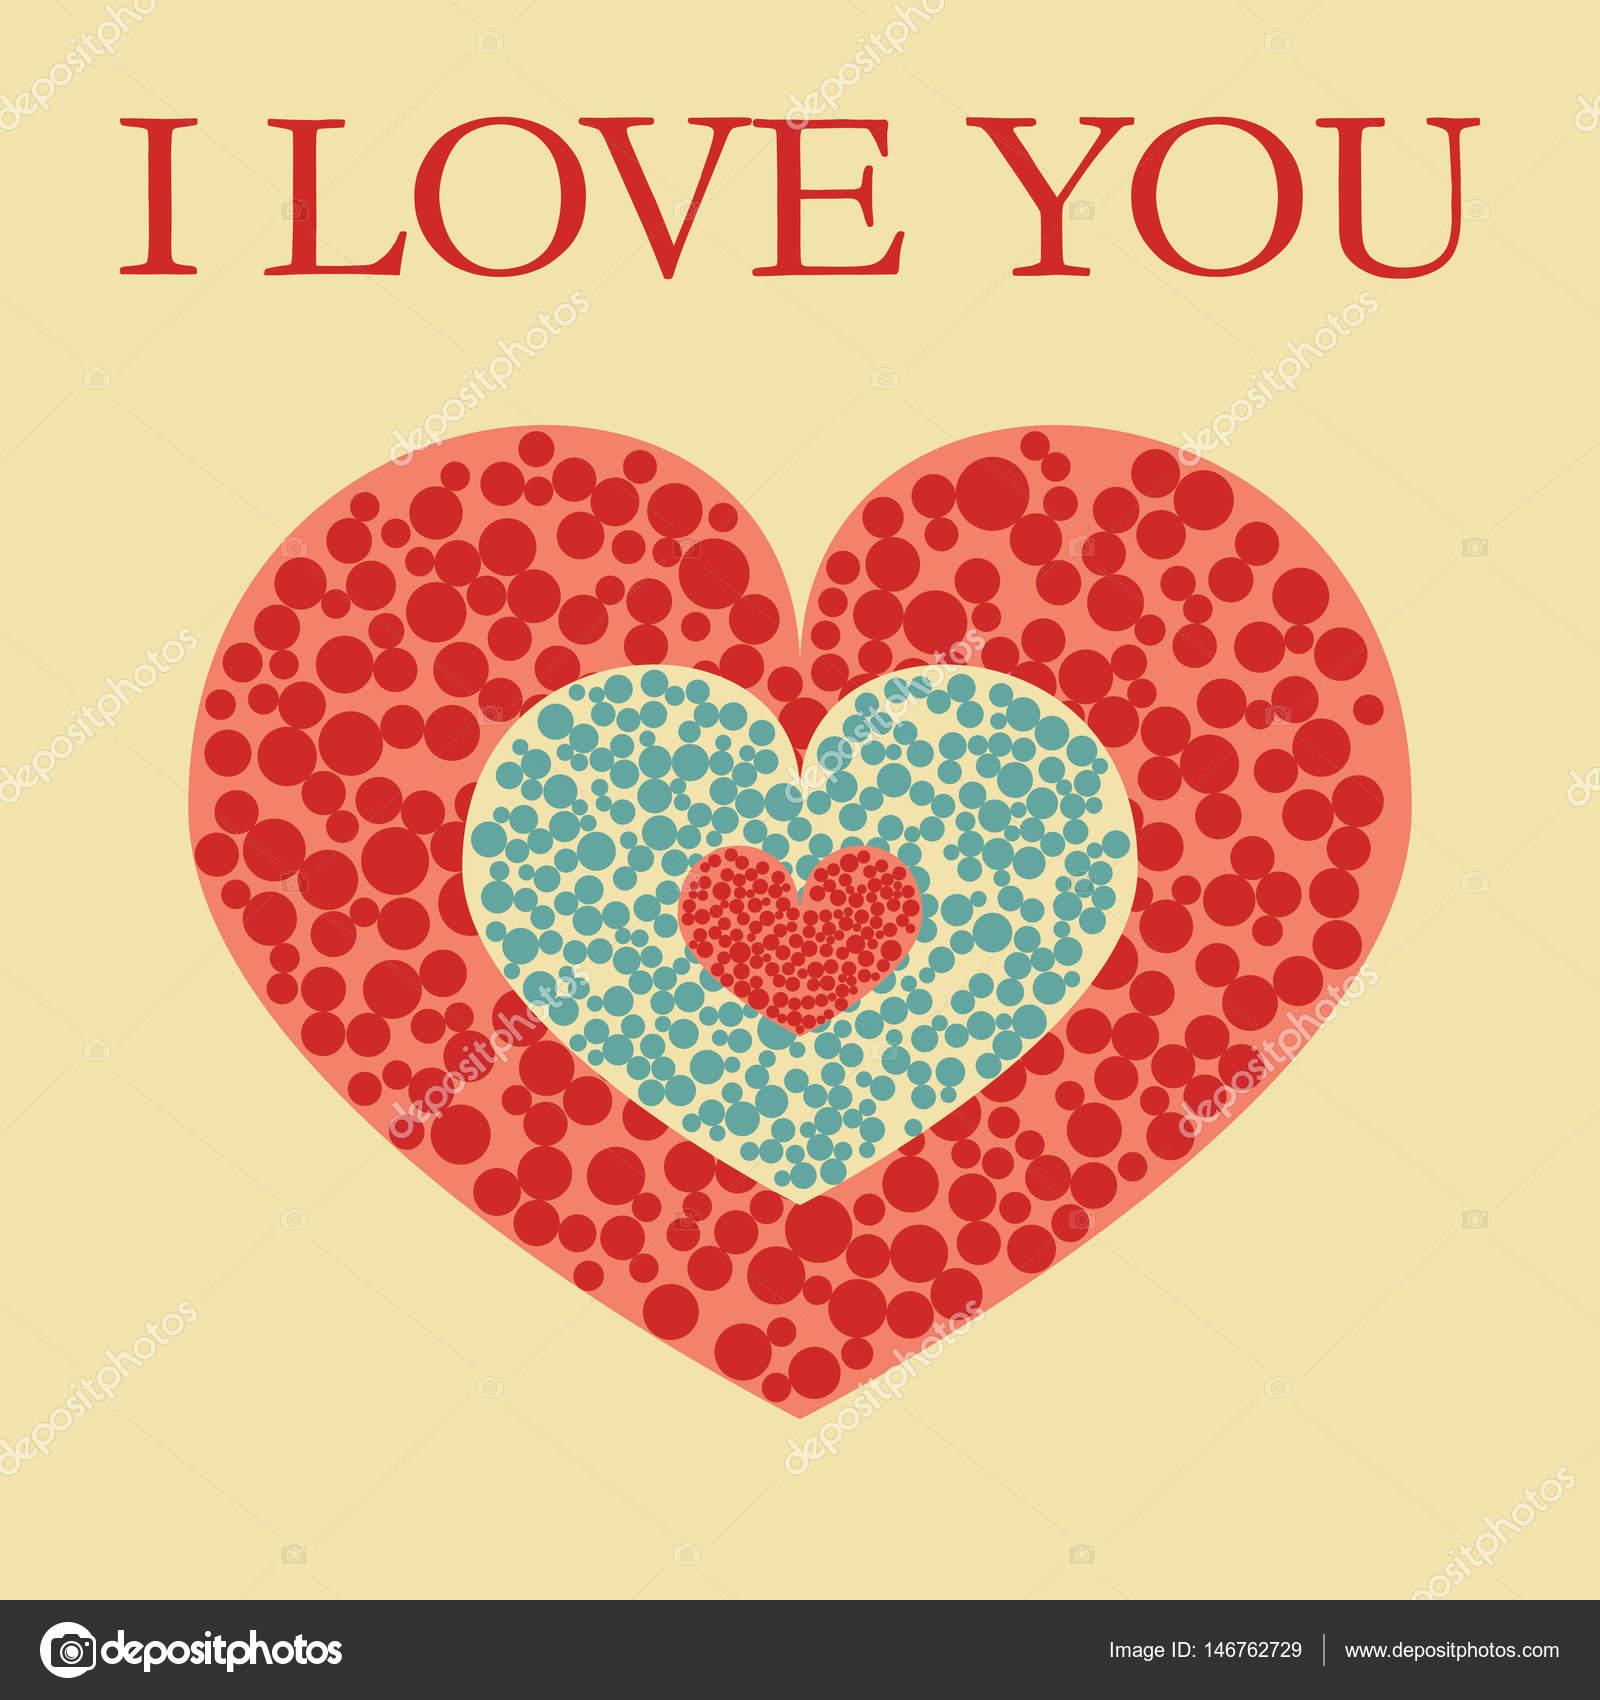 Kreis-Herz ich liebe dich blau — Stockvektor © Miaynata #146762729